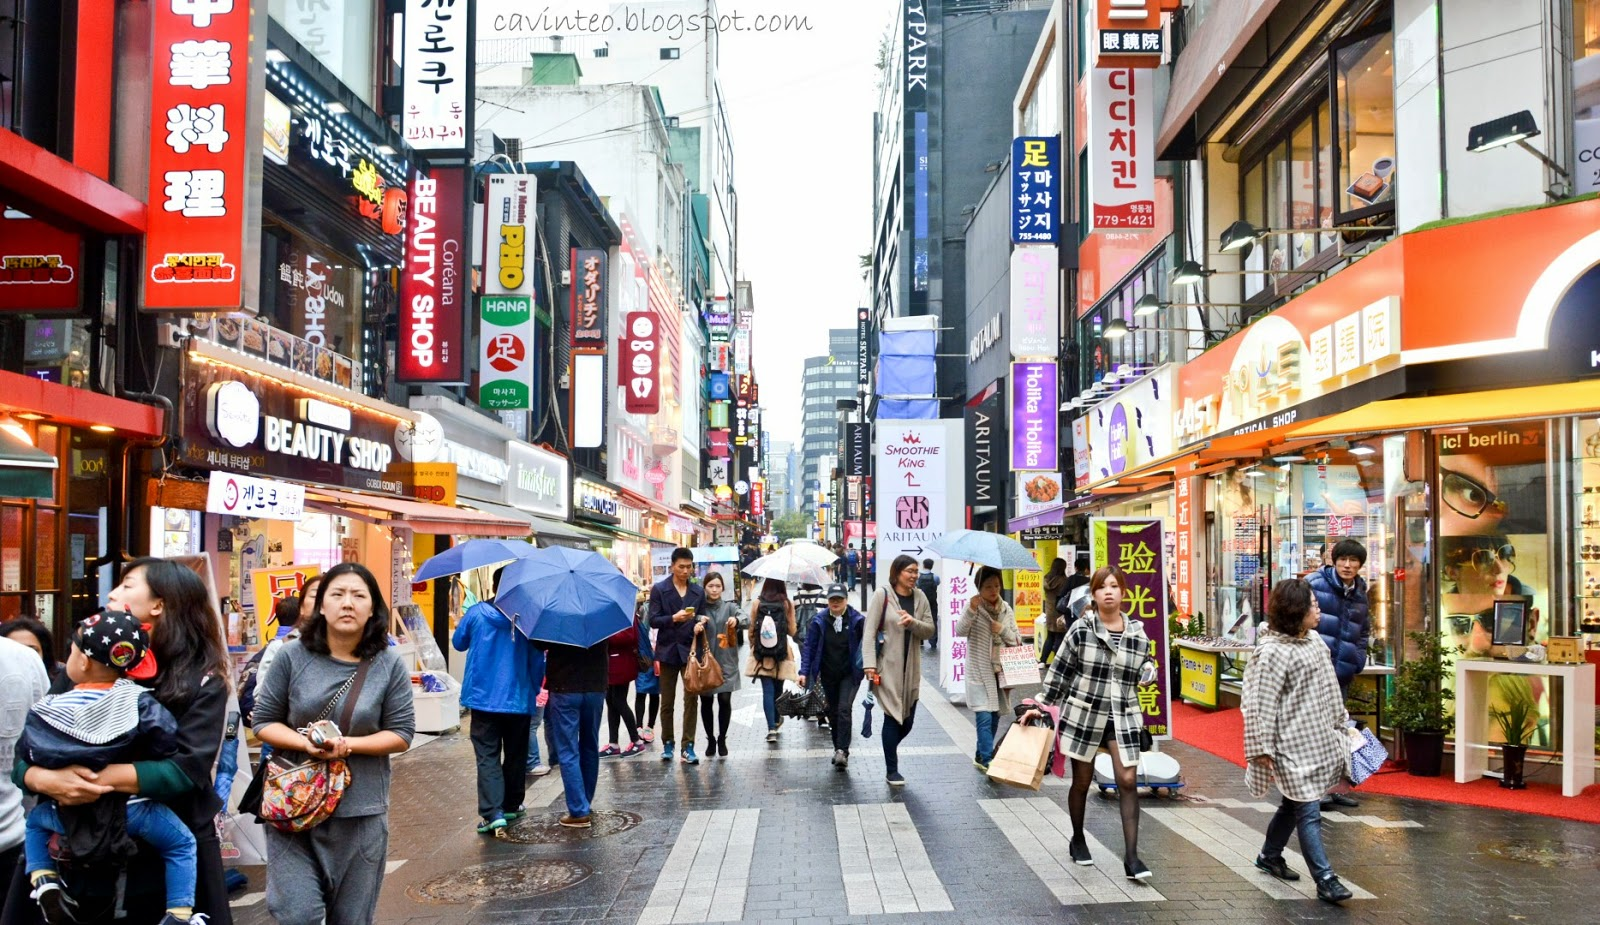 8 Fakta Unik Myeongdong, Korea Selatan, dari Barang Gratisan hingga SPG Kece ala Boyband